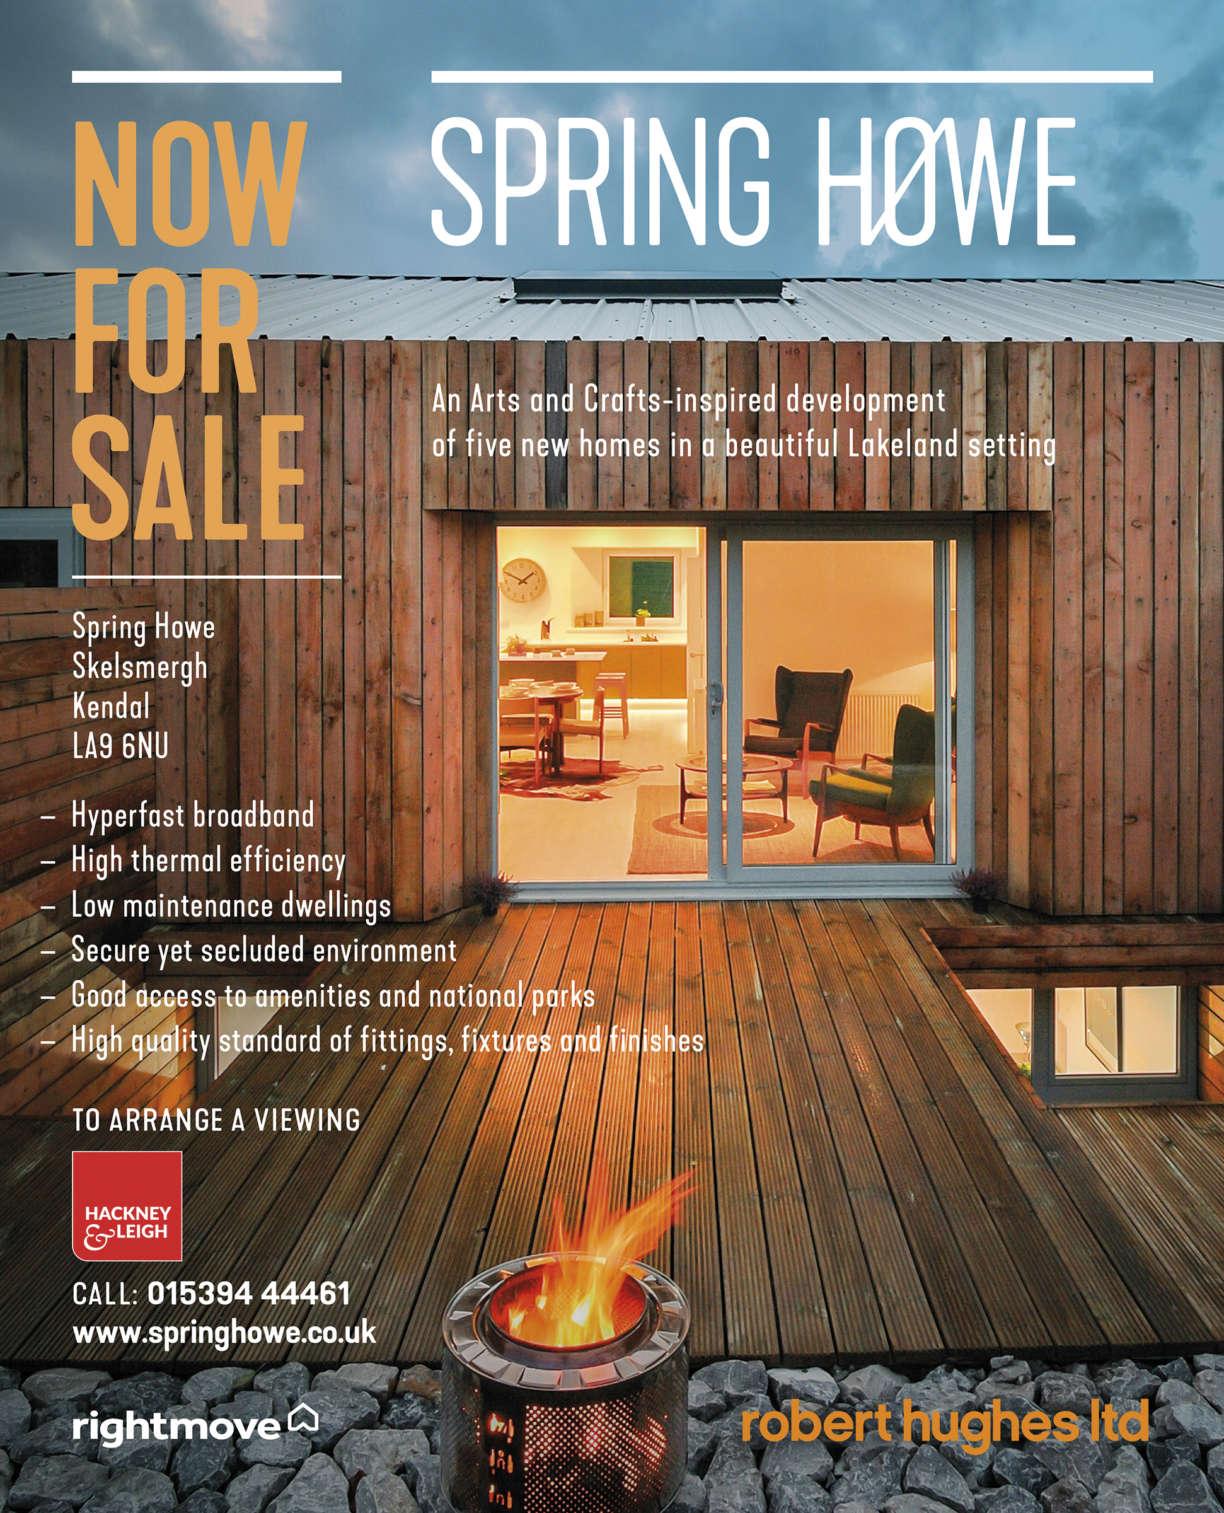 Spring-Howe-ad